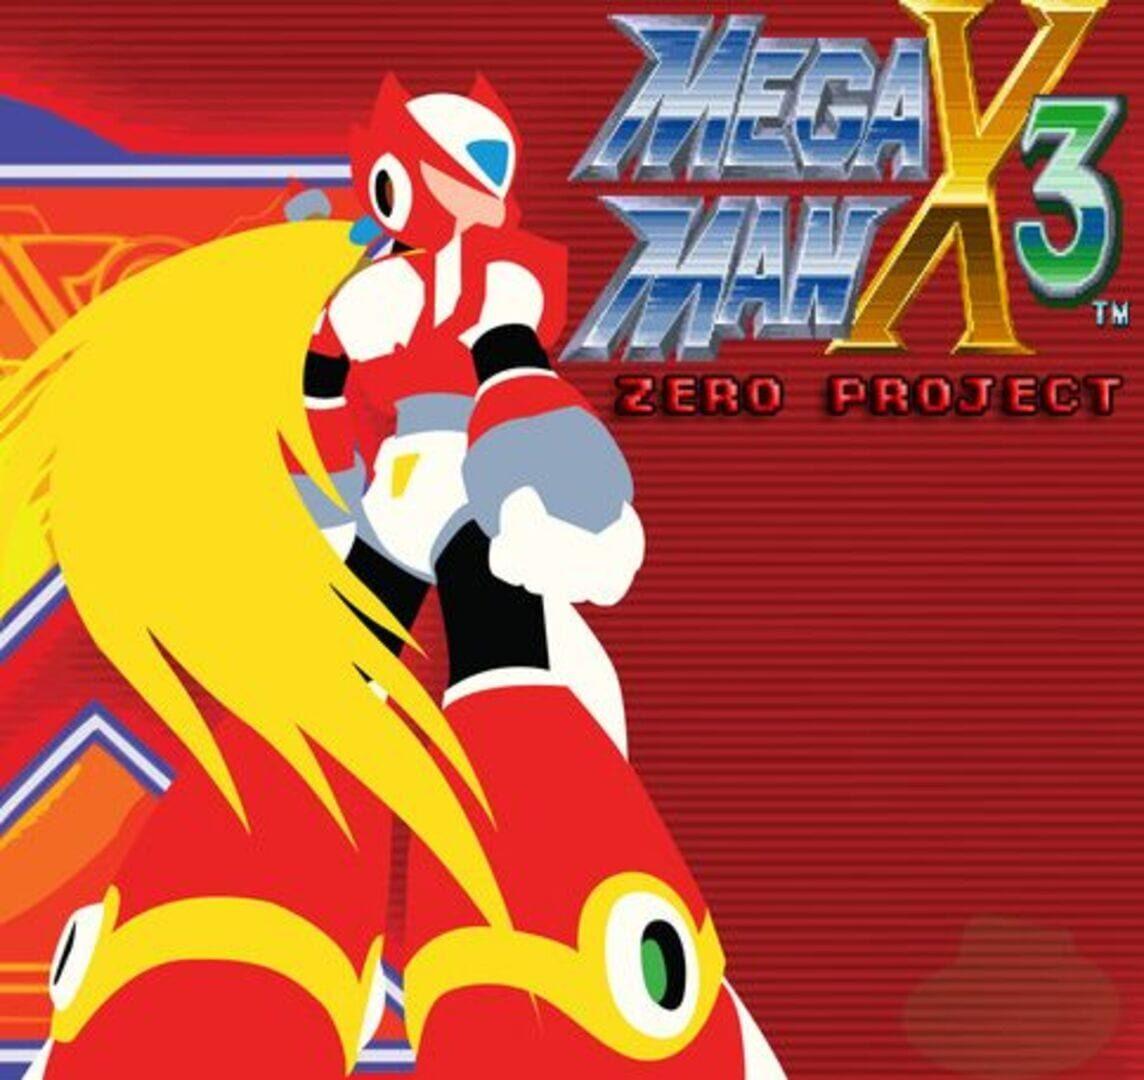 buy Mega Man X3 - Zero Project cd key for all platform